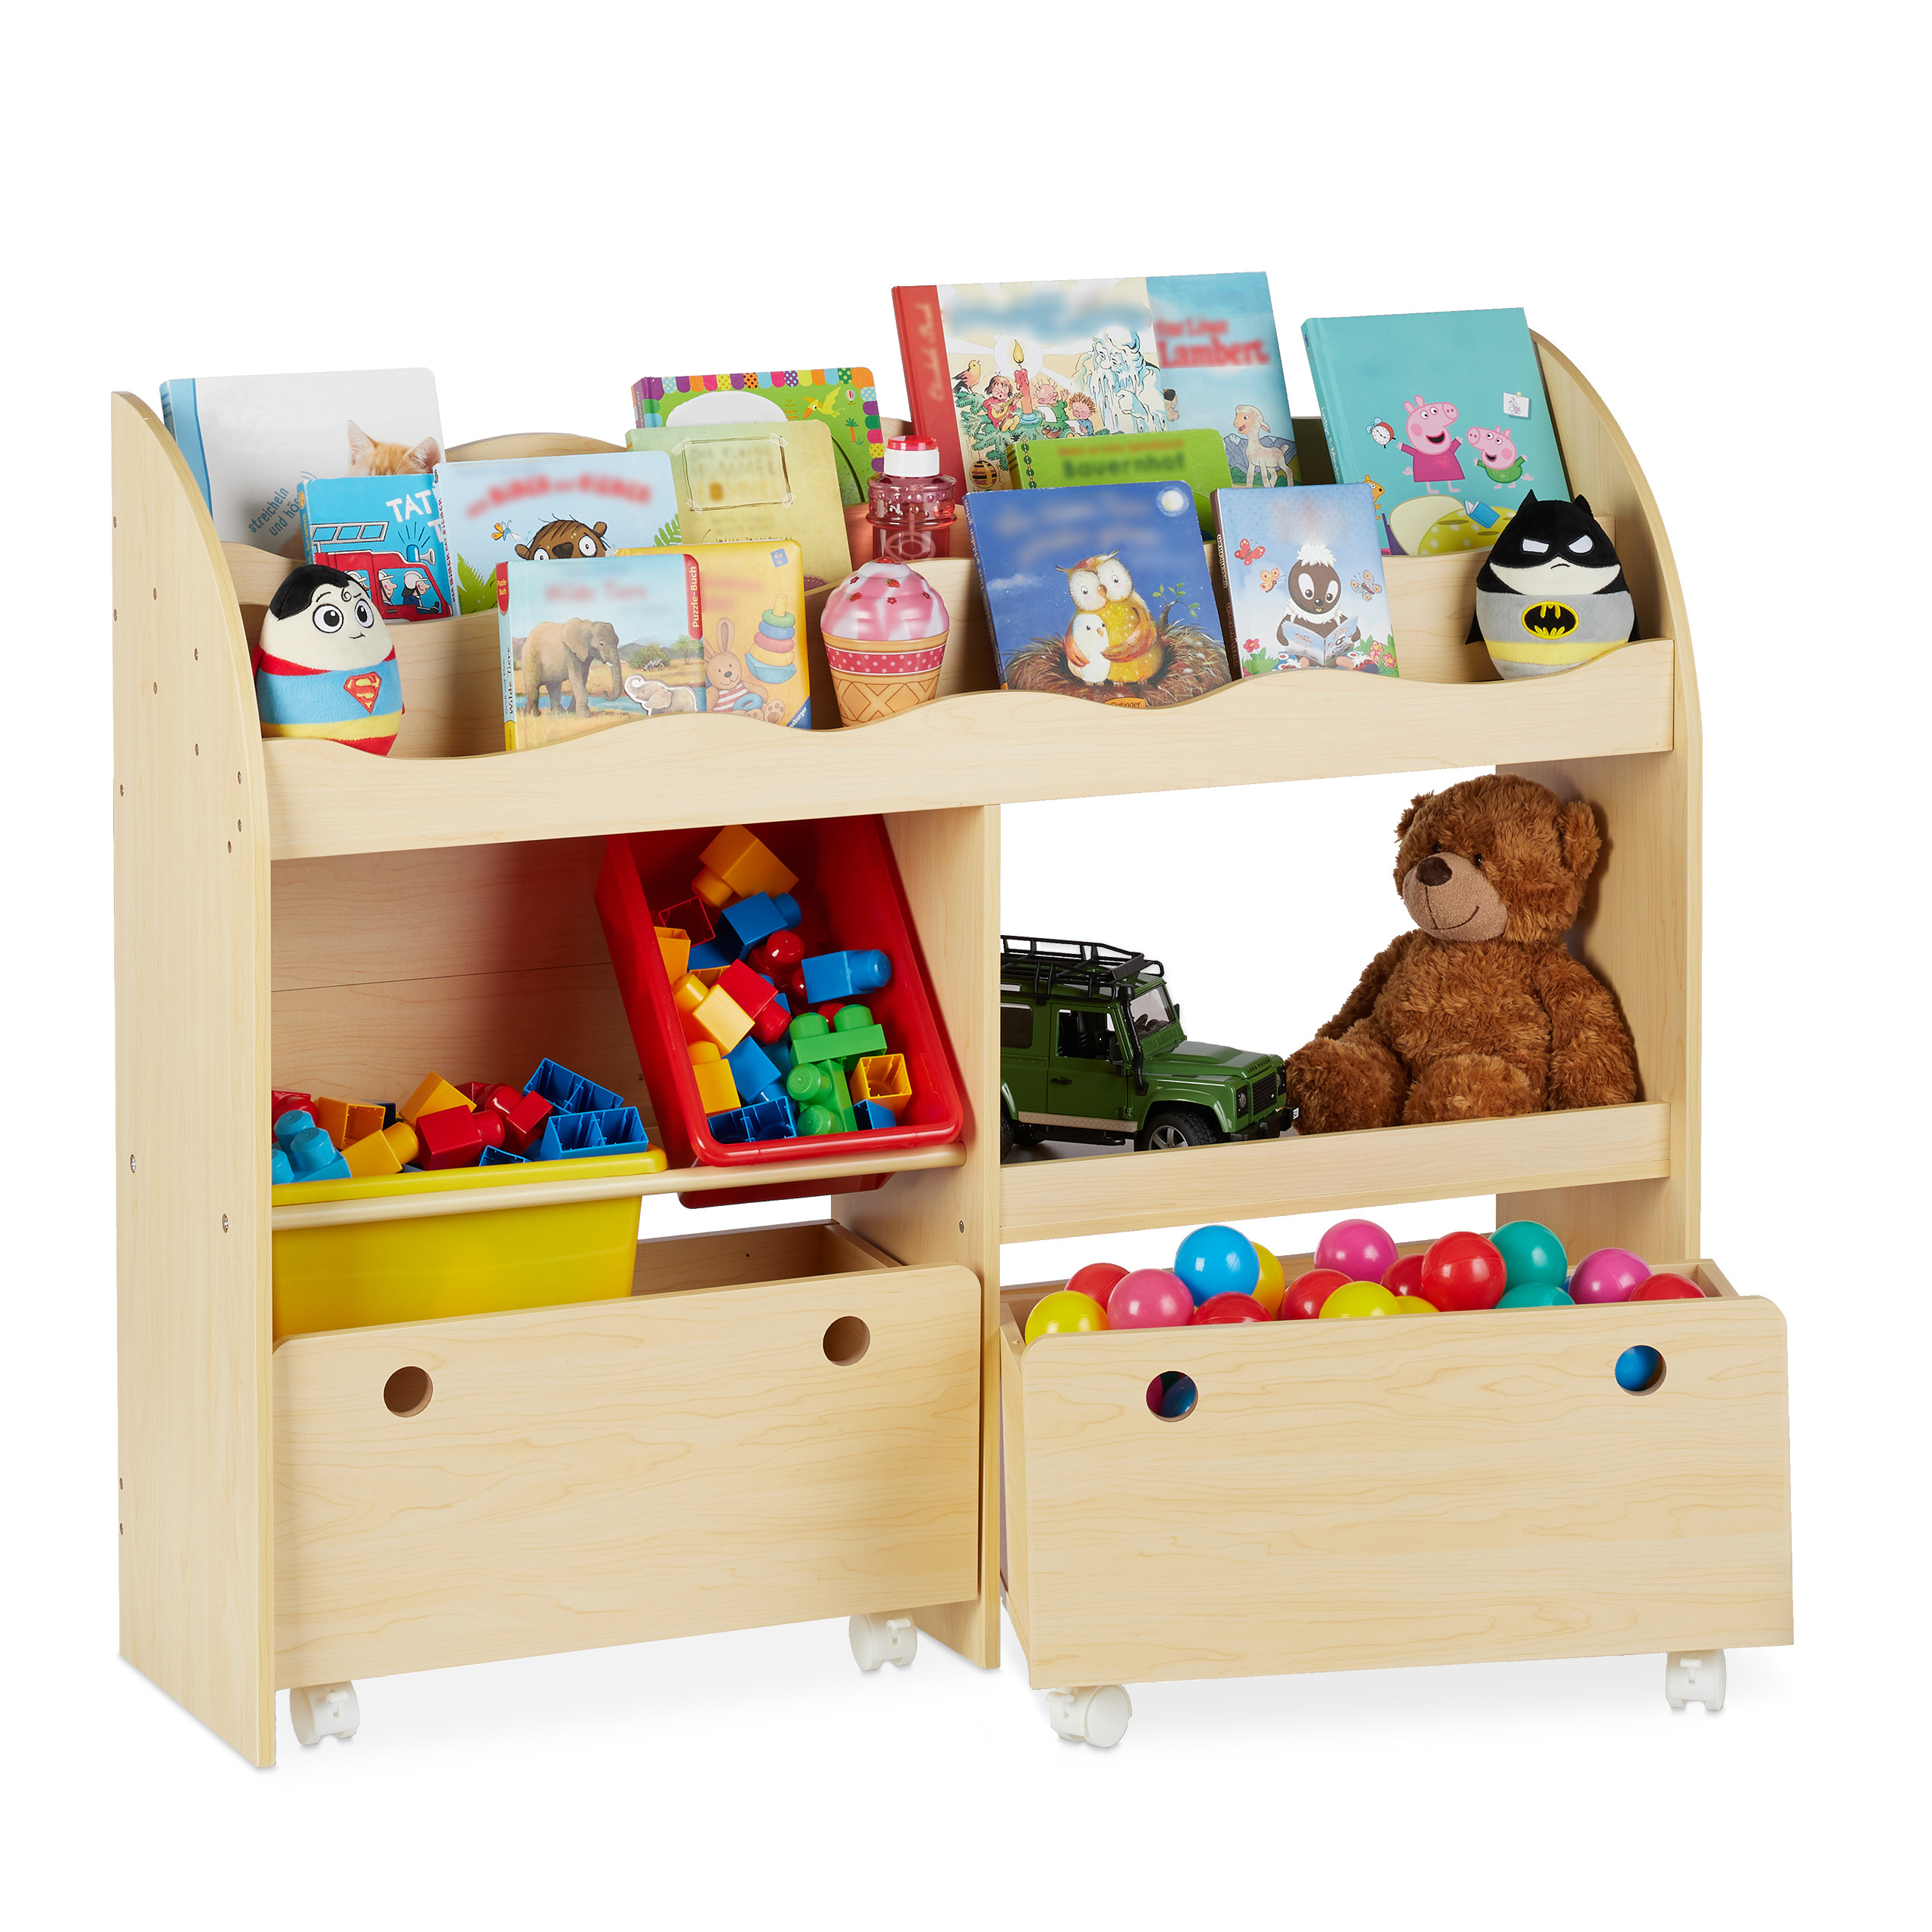 Relaxdays Kinderregal mit 9 Stoffboxen Meerjungfrau Kindermotiv 1 St/ück bunt Spielzeugregal Organizer HBT 66 x 82,5 x 29,5 cm